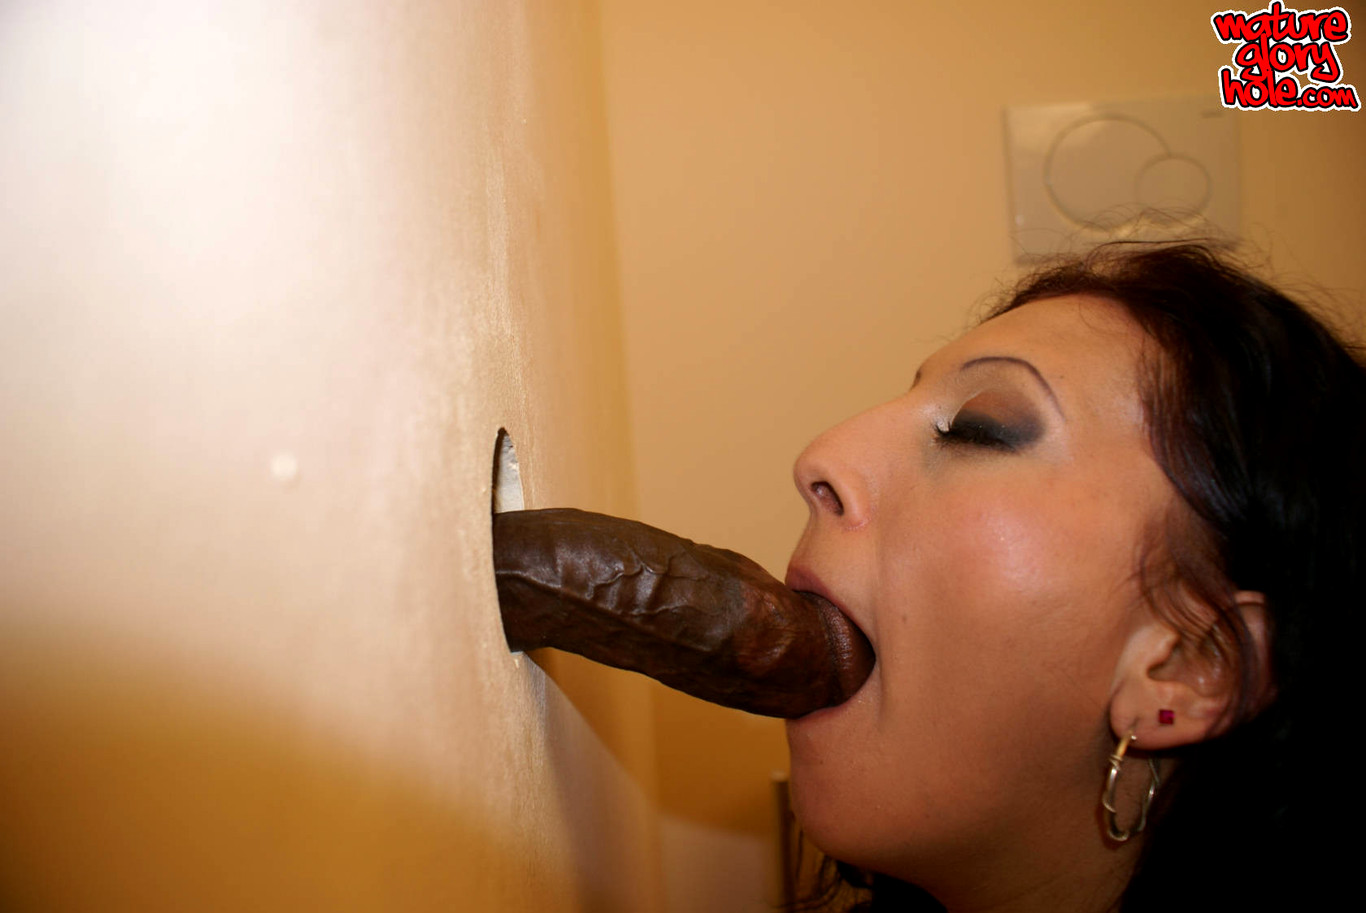 Gloryhole moms vid free, hot nude masturbating latinas